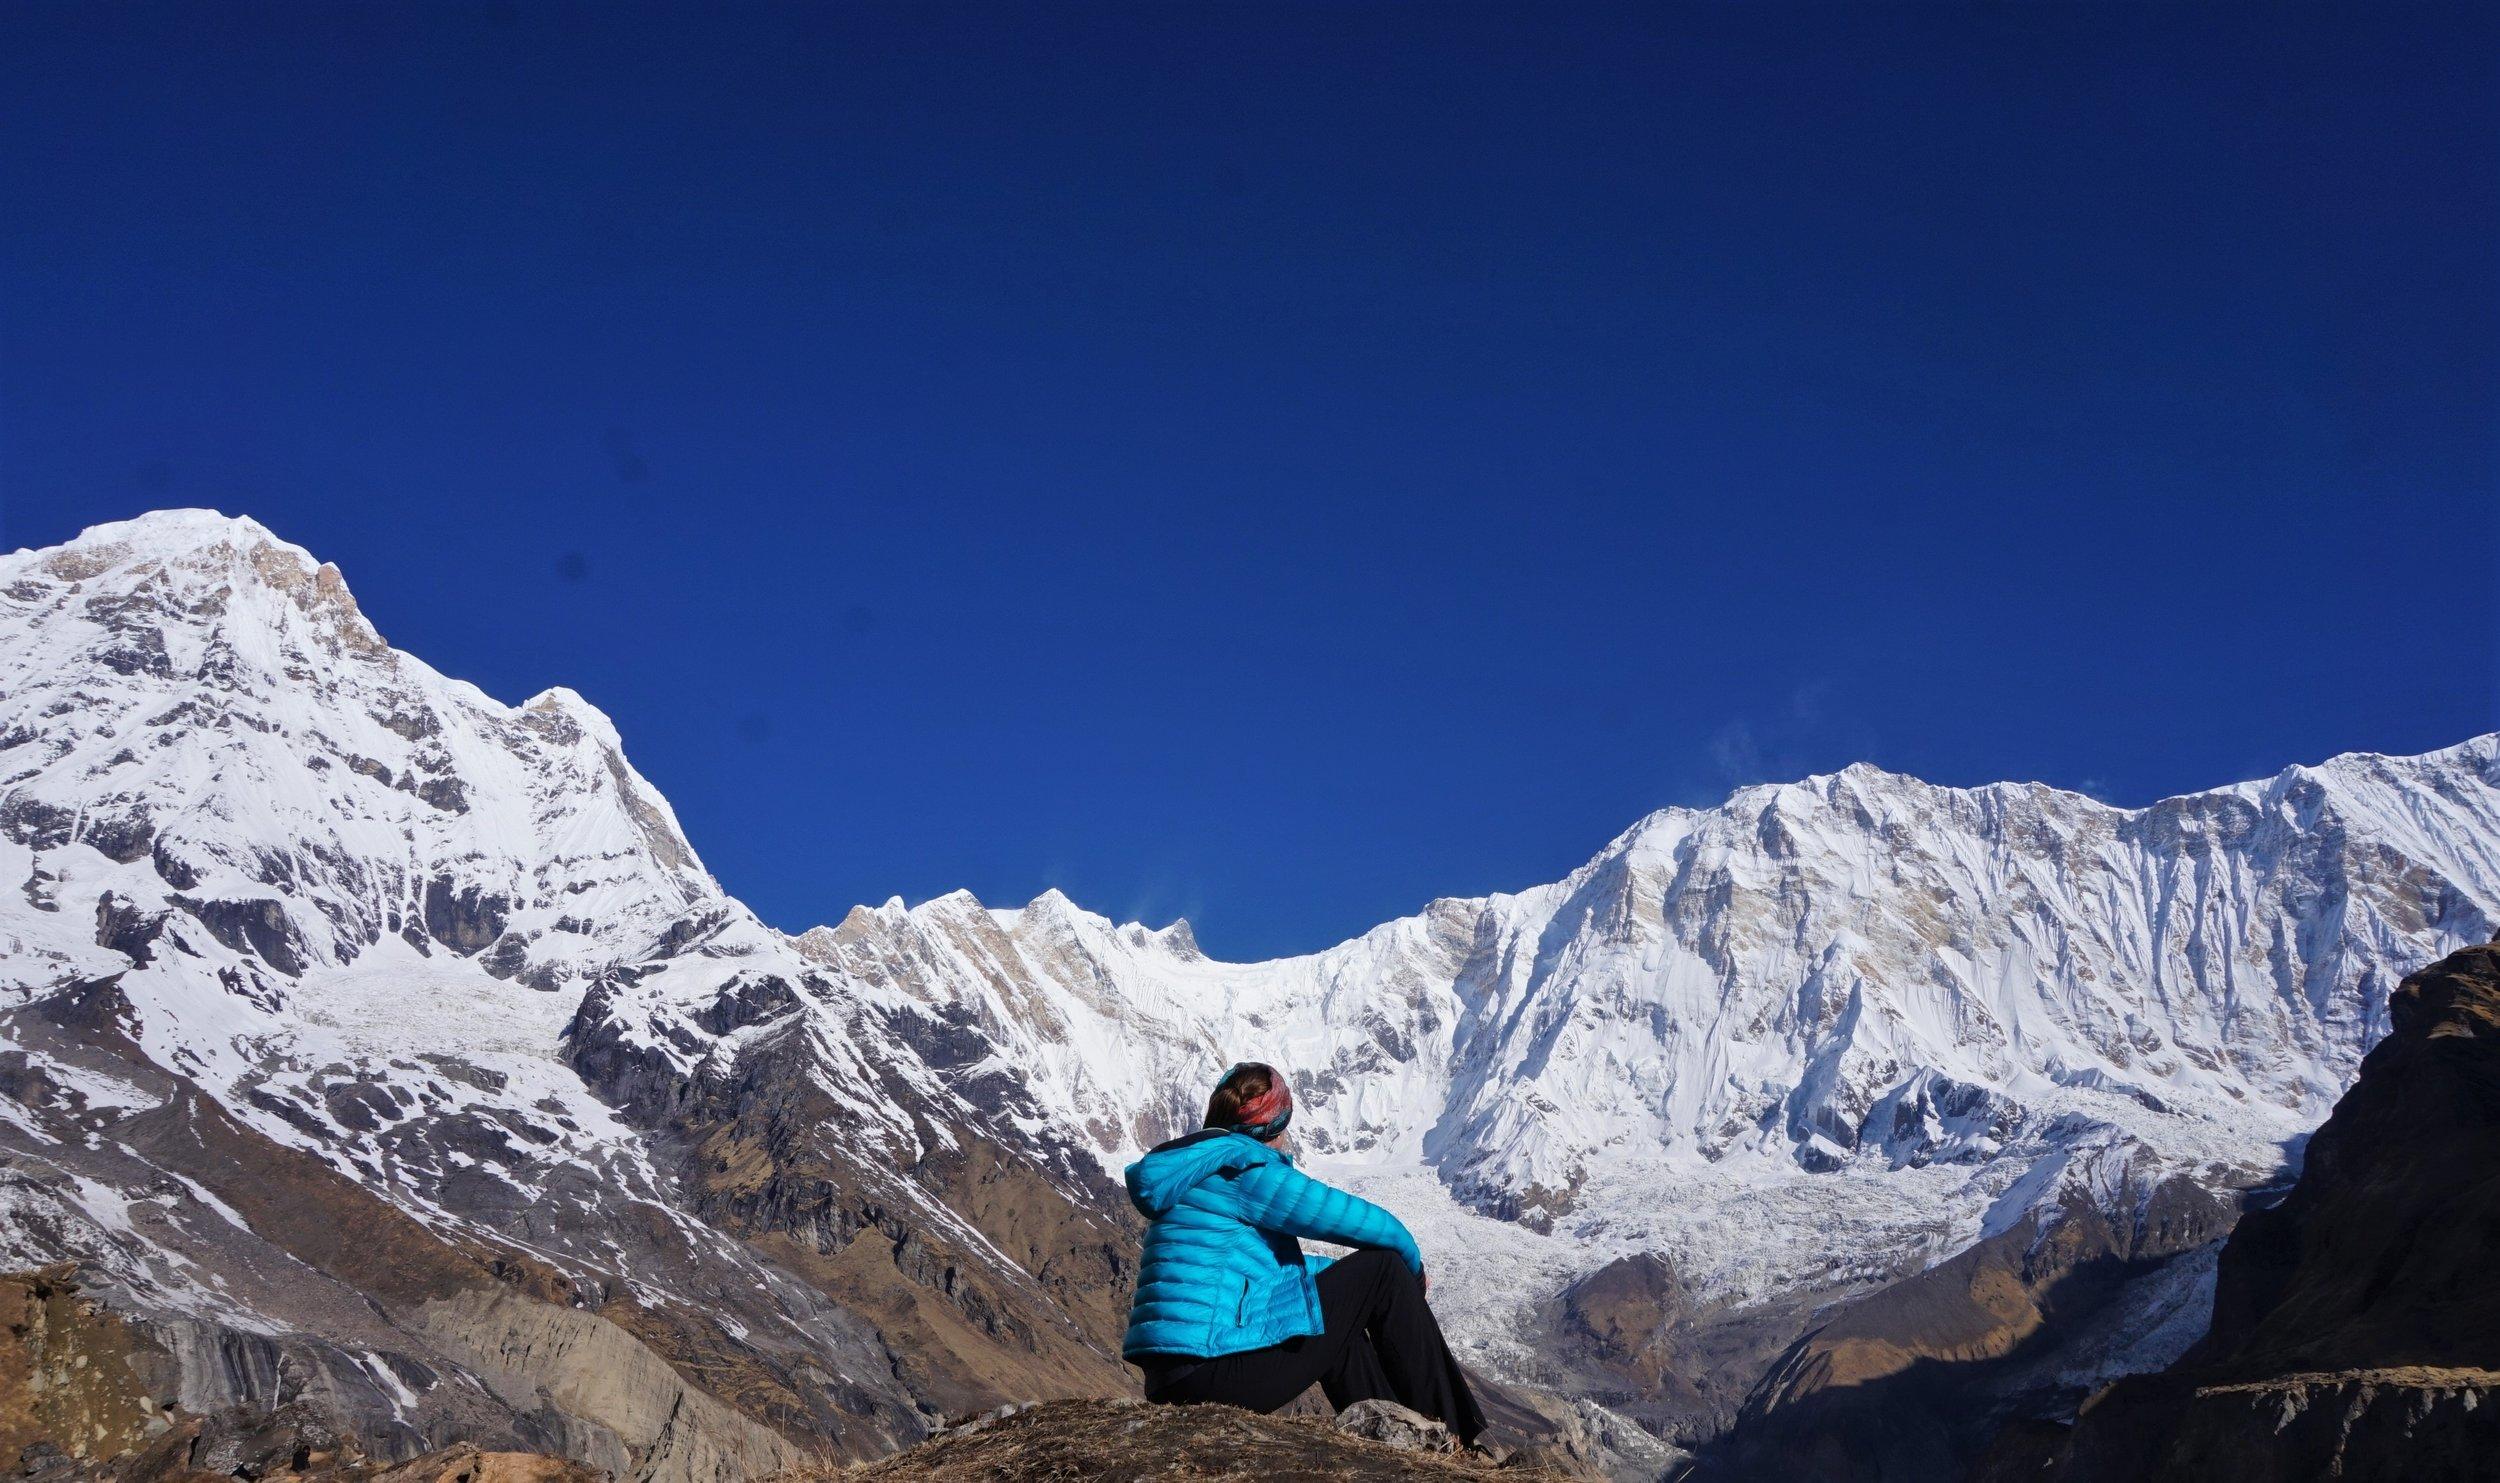 Amazing views of the Himalayas mountain range!